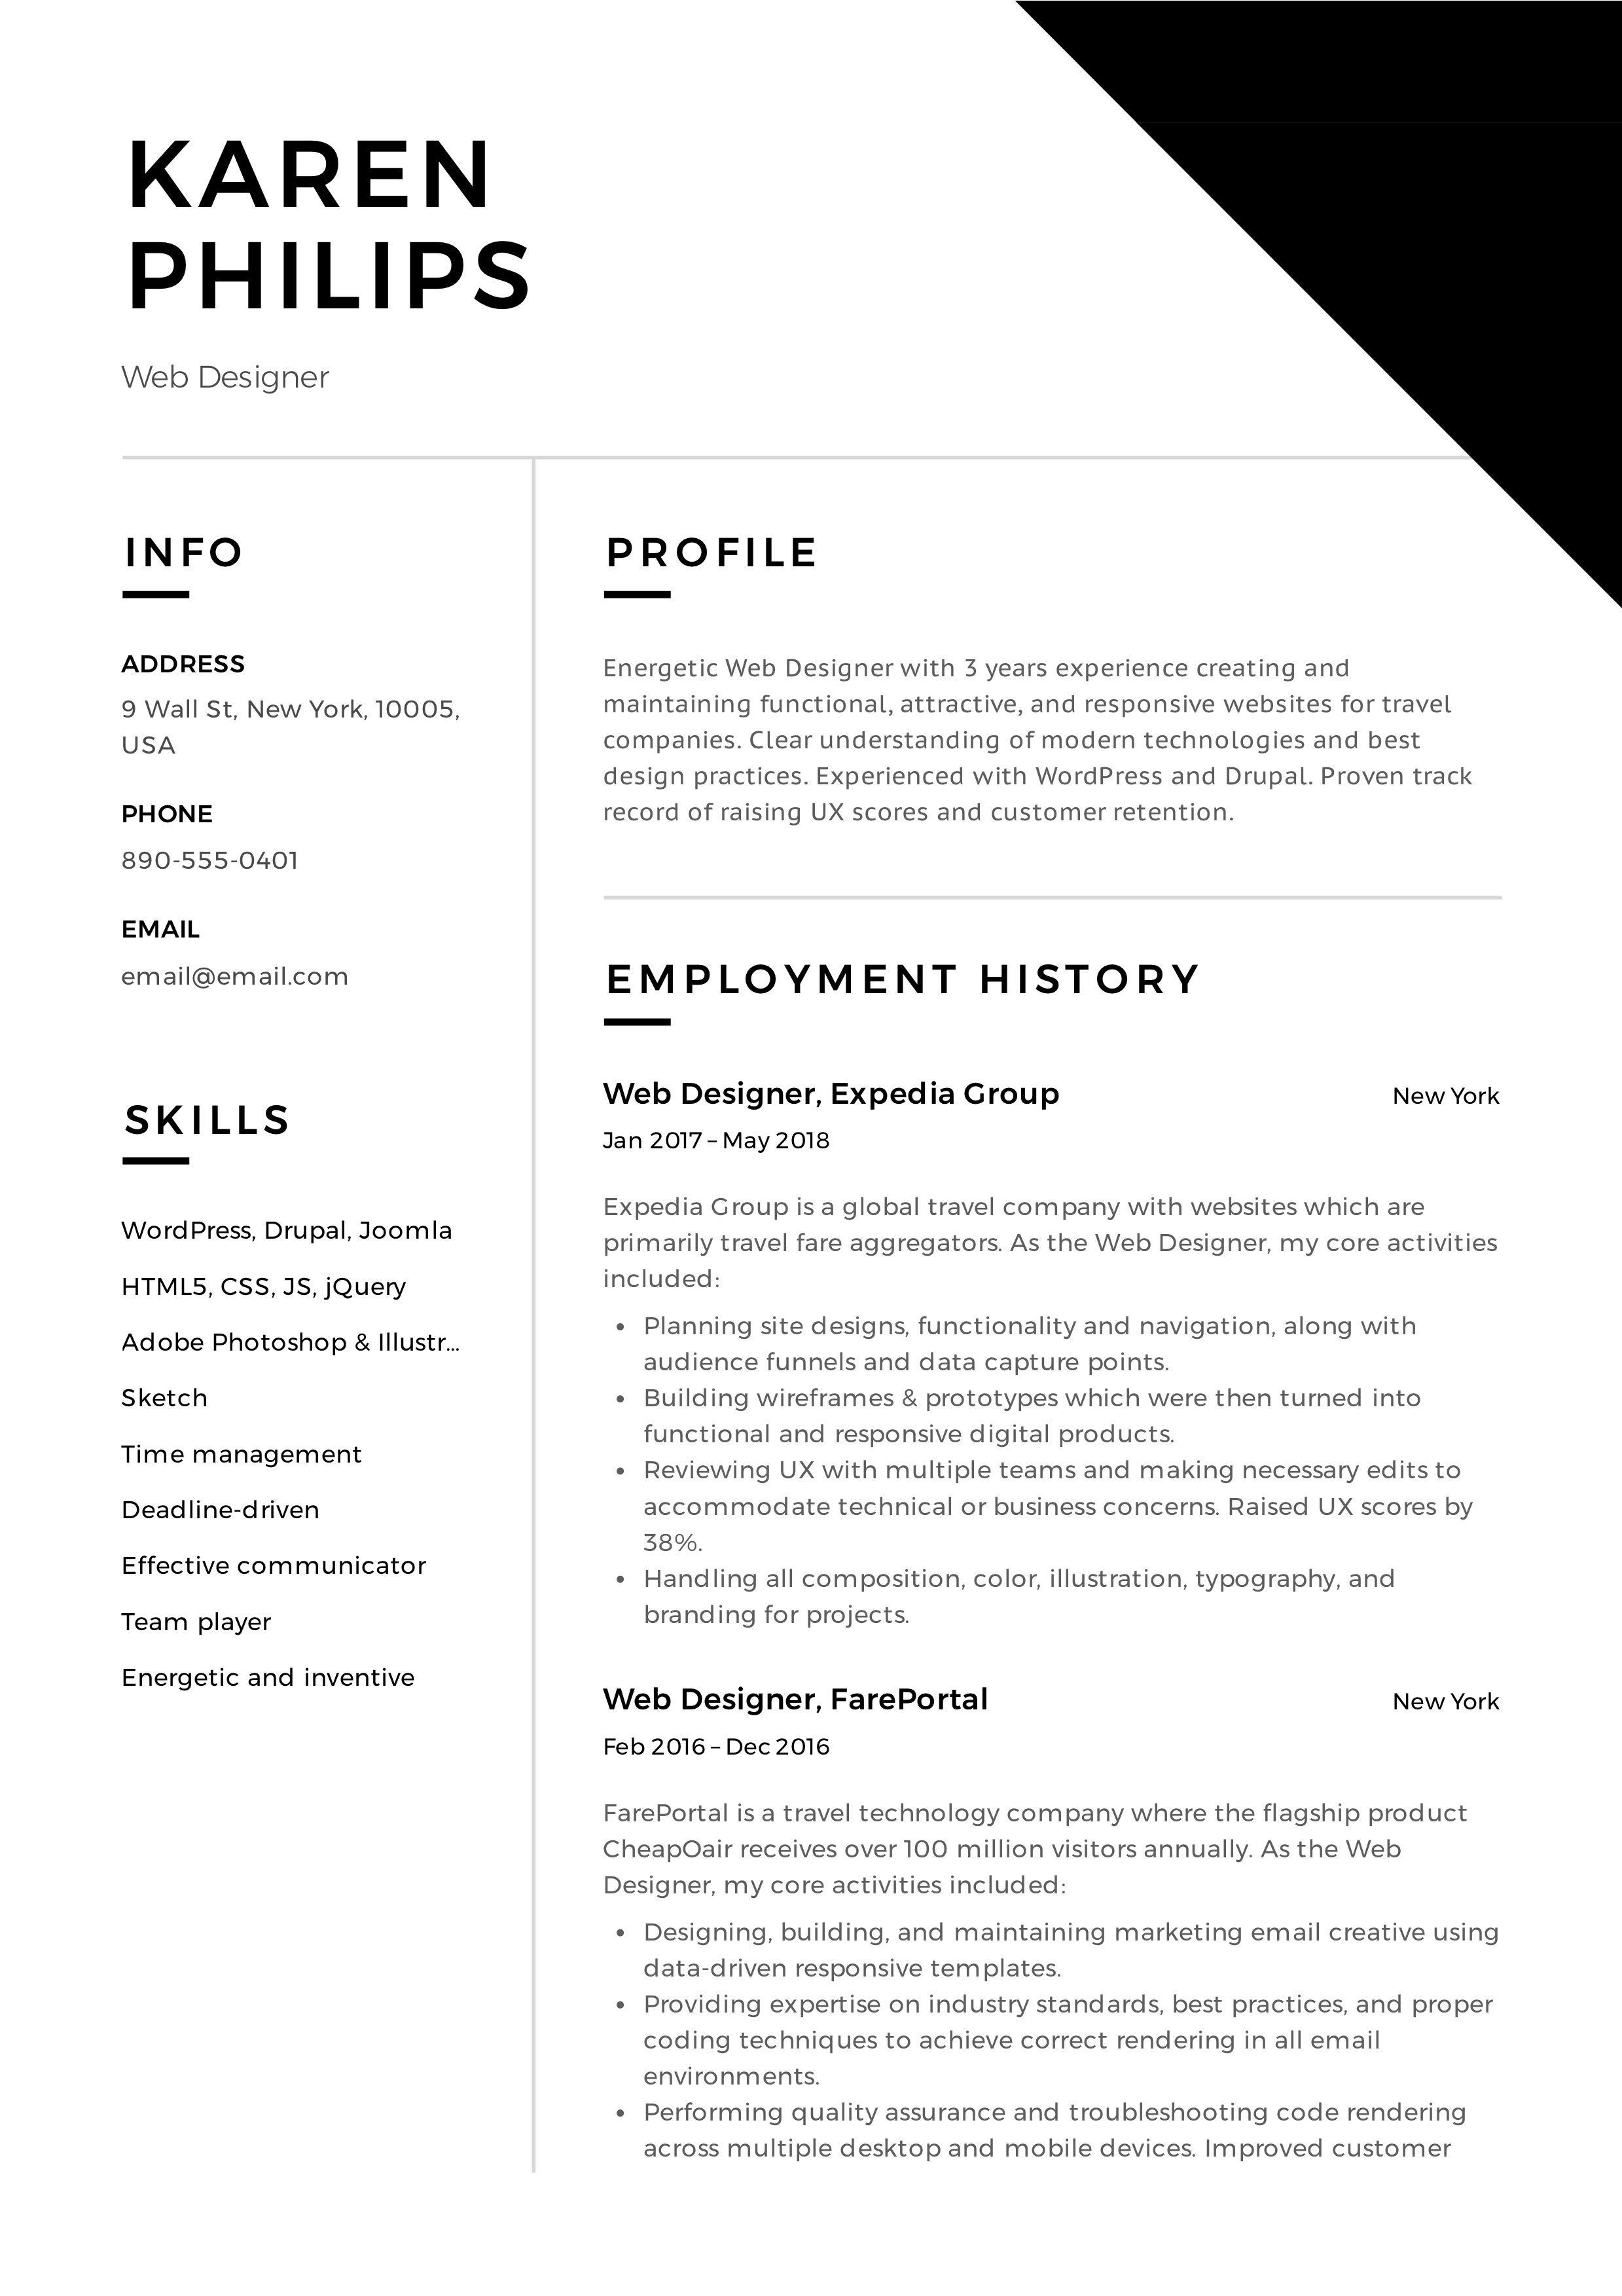 Web Designer Resume Example Event Planner Resume Professional Resume Examples Resume Examples